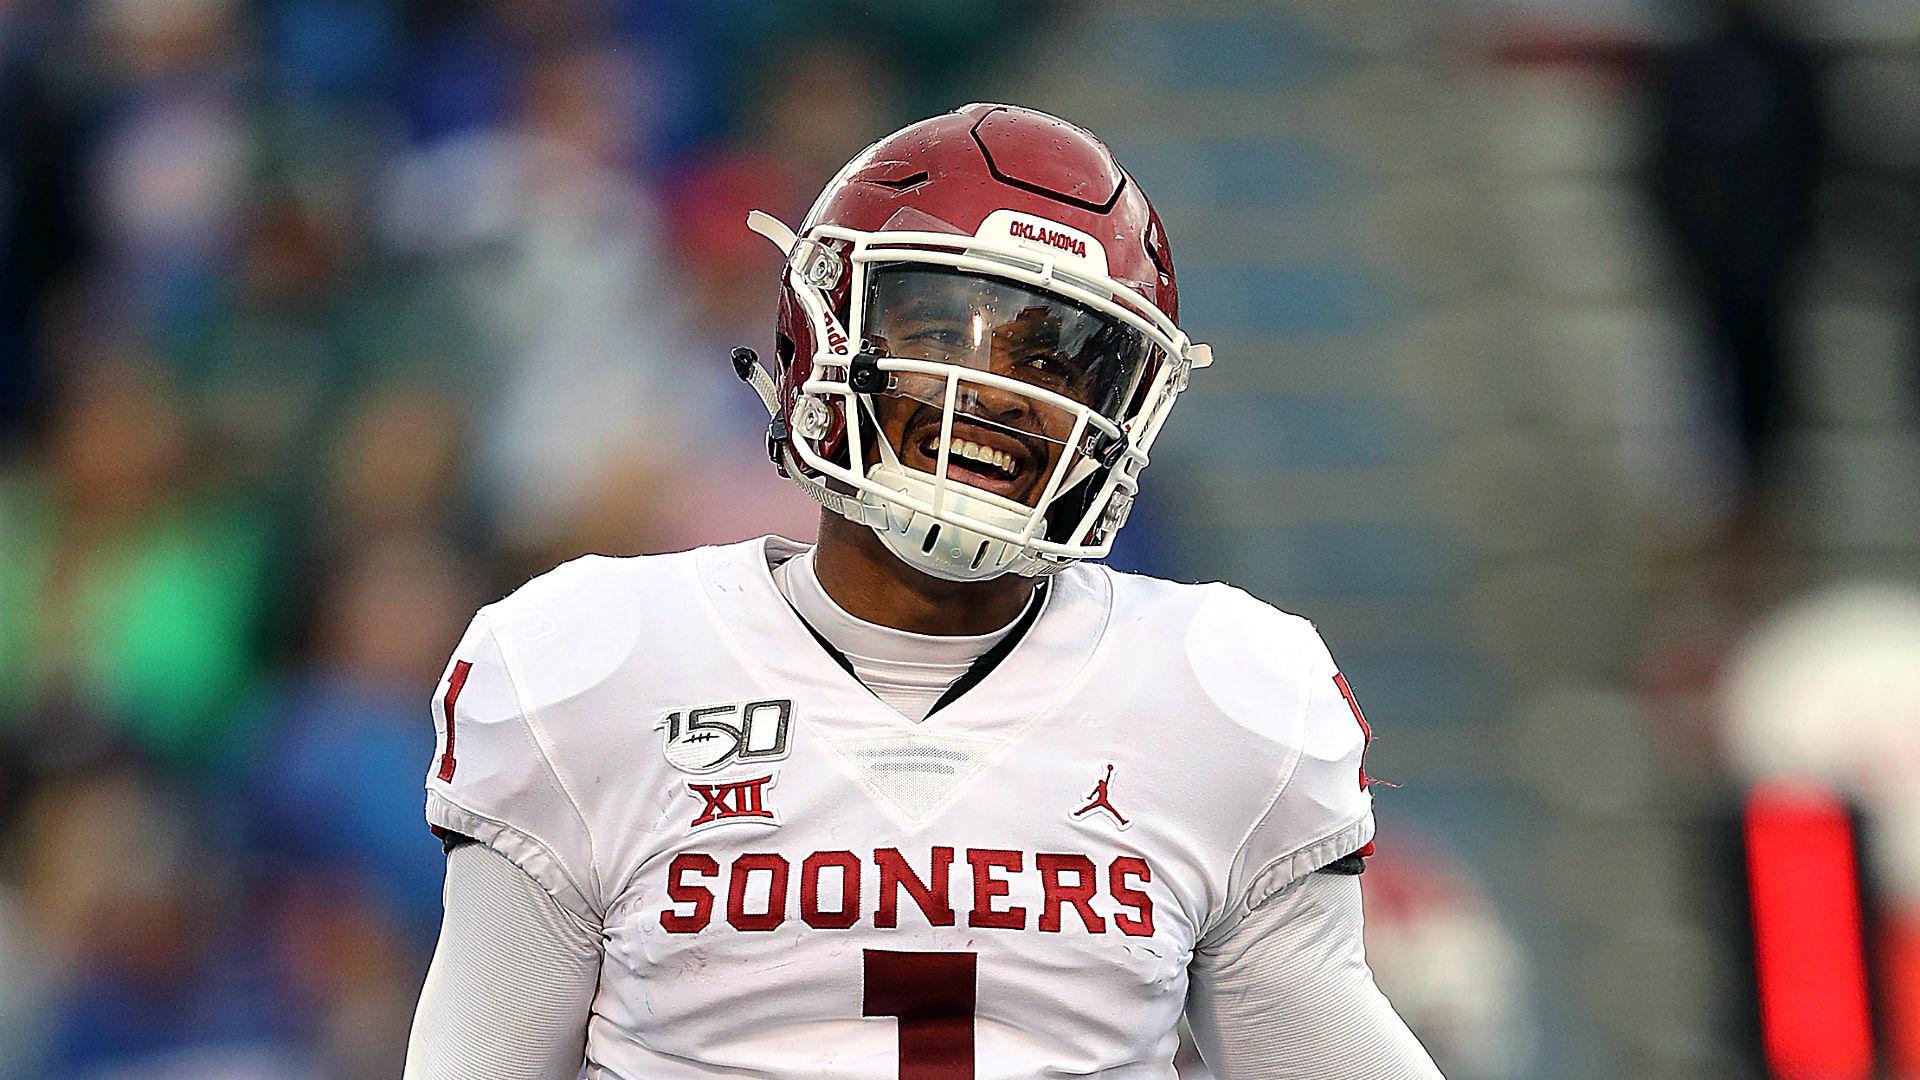 To beat Texas, Oklahoma's Jalen Hurts